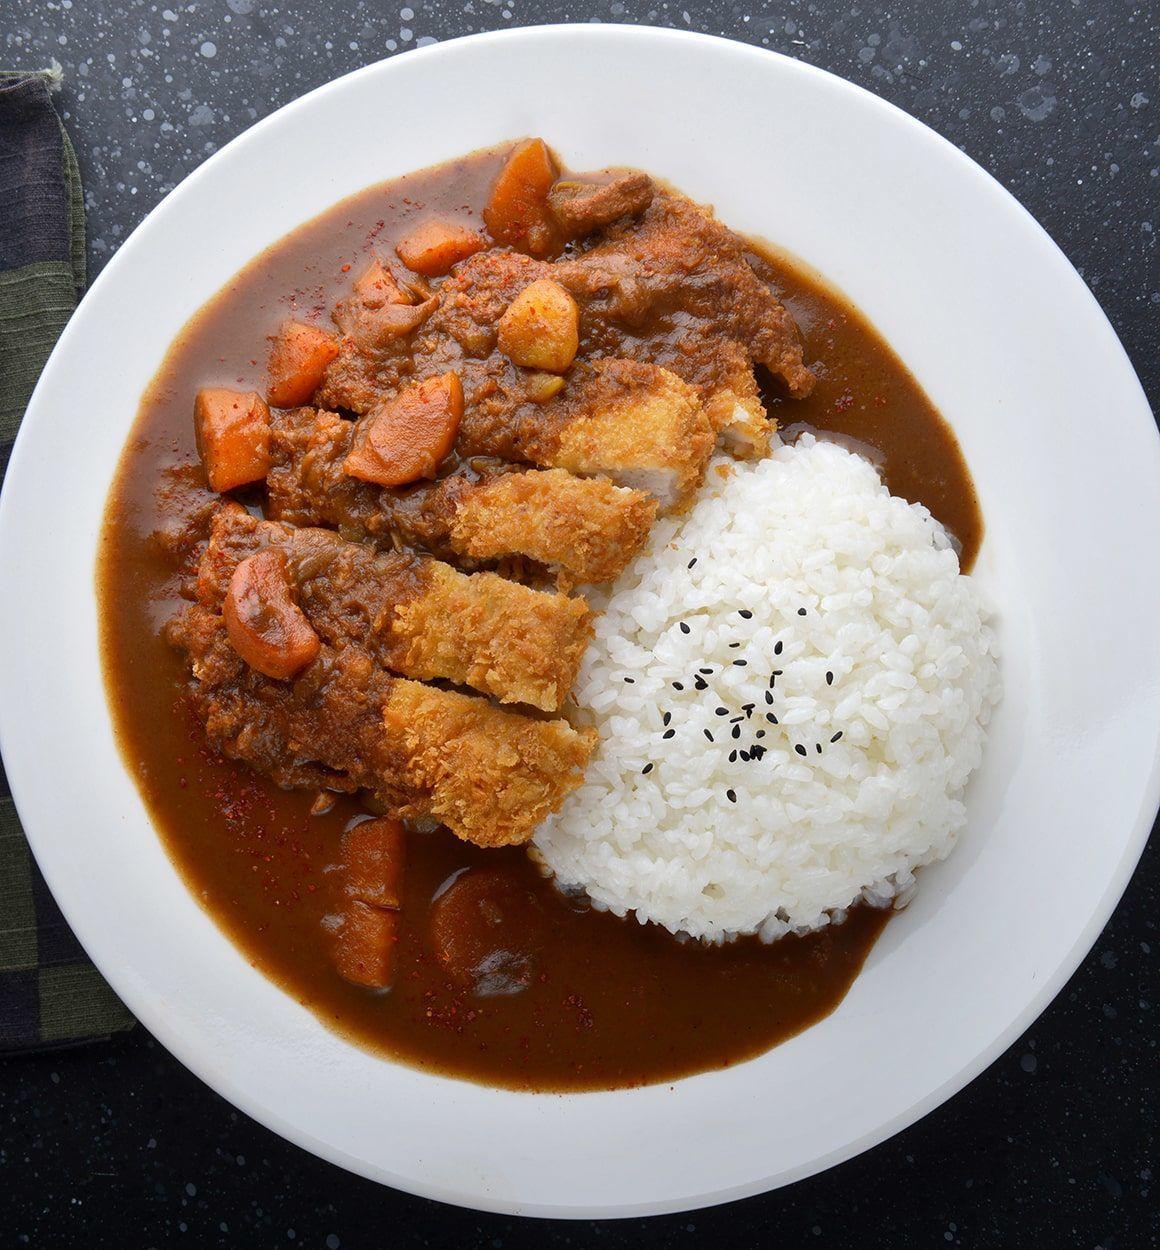 Chicken Katsu Curry Recipe Ninja Ninja Foodi 6 5 Qt The Pressure Cooker That Crisps Op300 Katsu Curry Recipes Chicken Katsu Curry Recipes Recipes